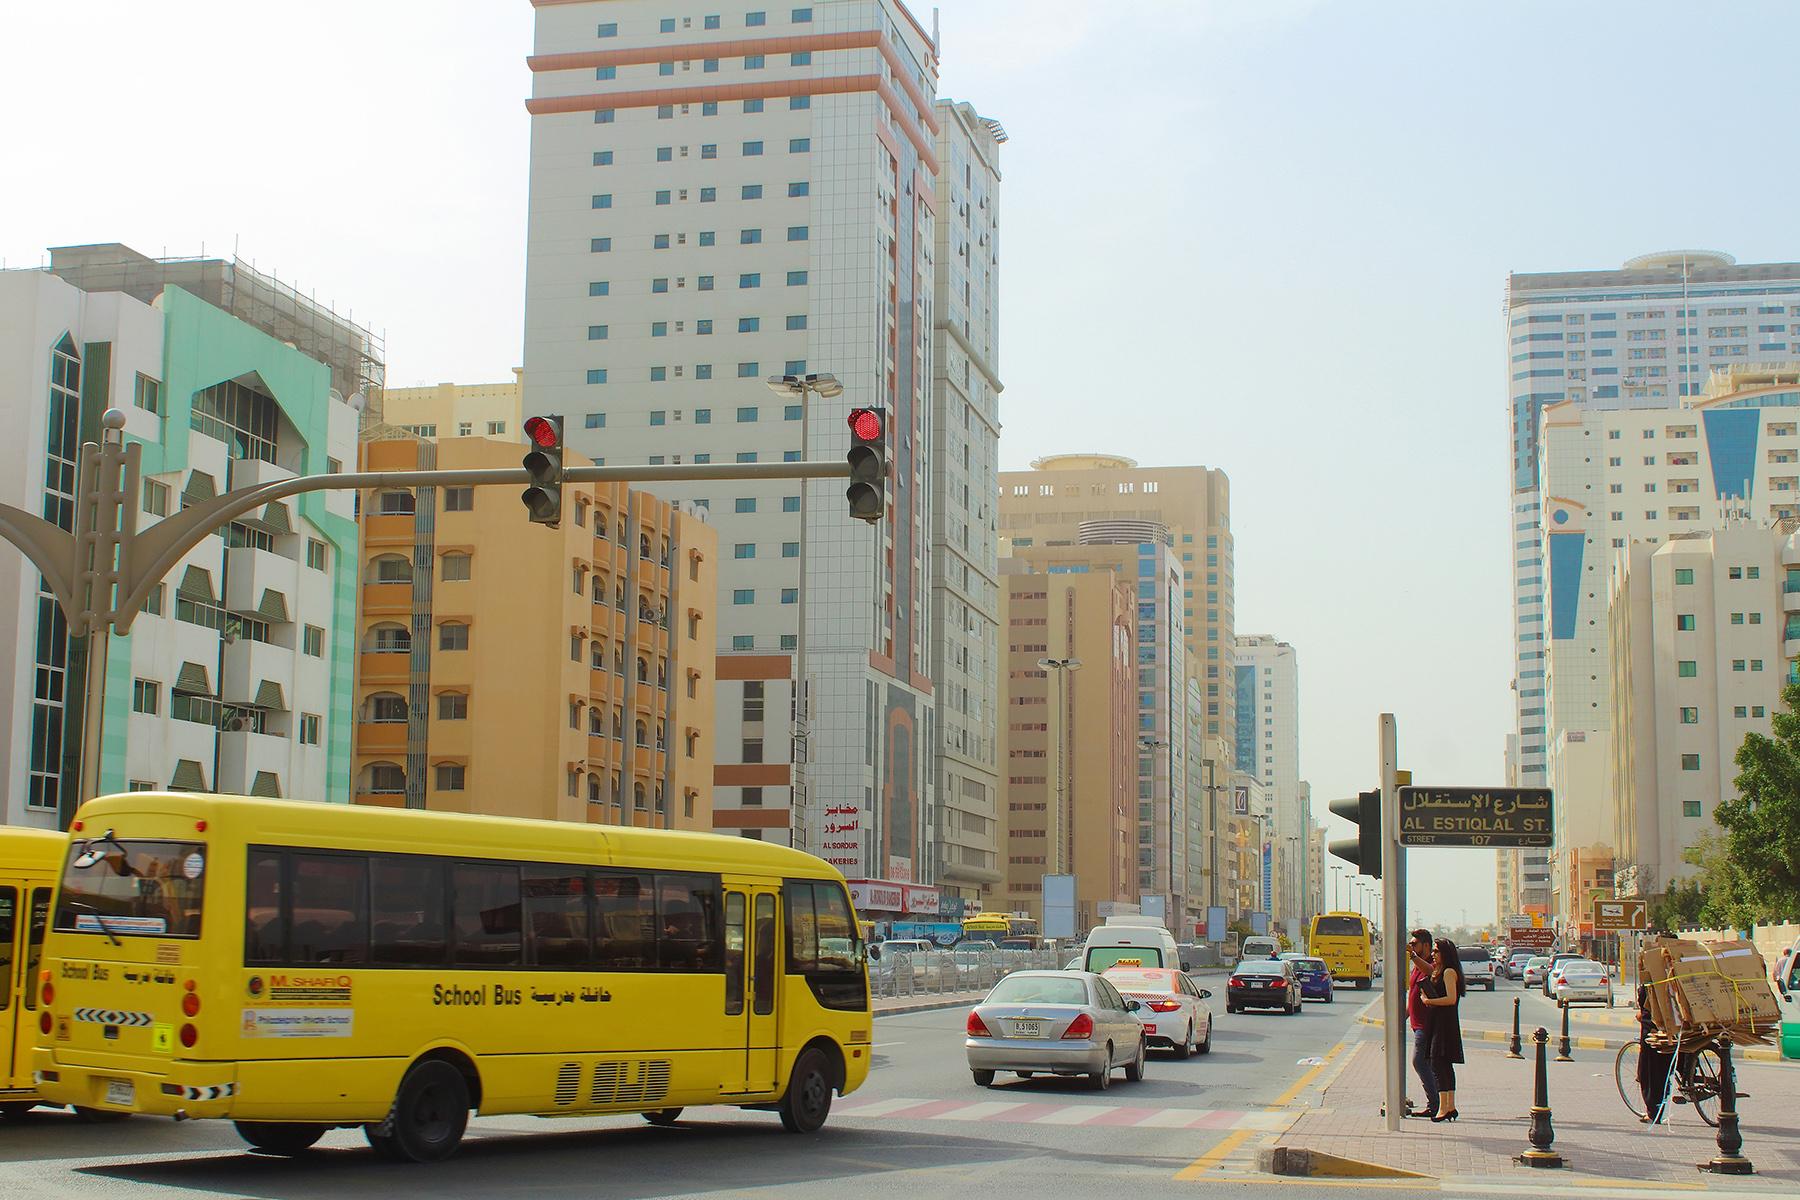 School bus in Sharjah